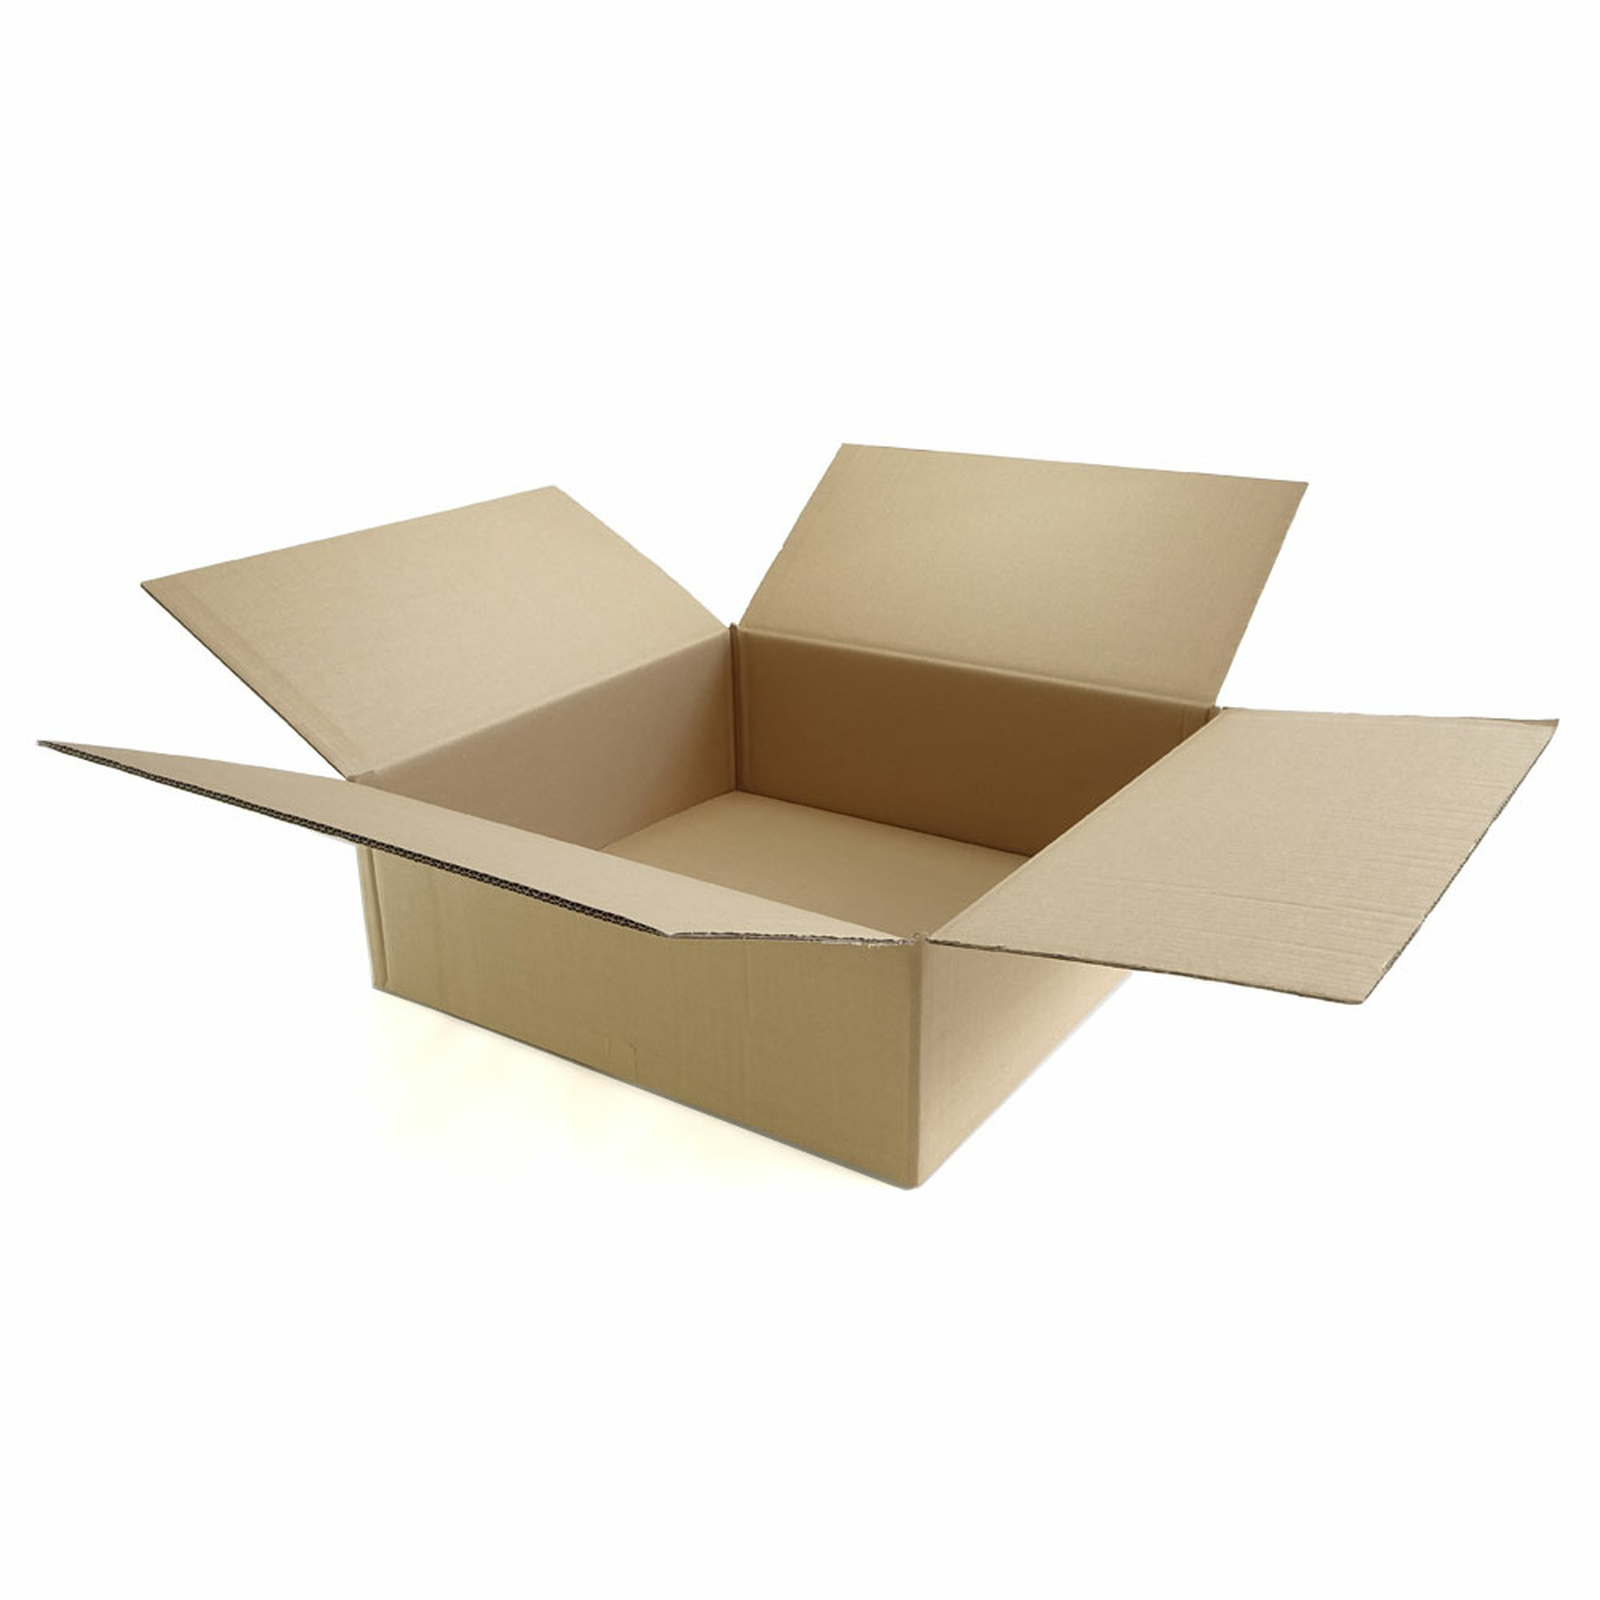 zweiwellige kartons 592x592x200 mm g nstig kaufen 1 99. Black Bedroom Furniture Sets. Home Design Ideas